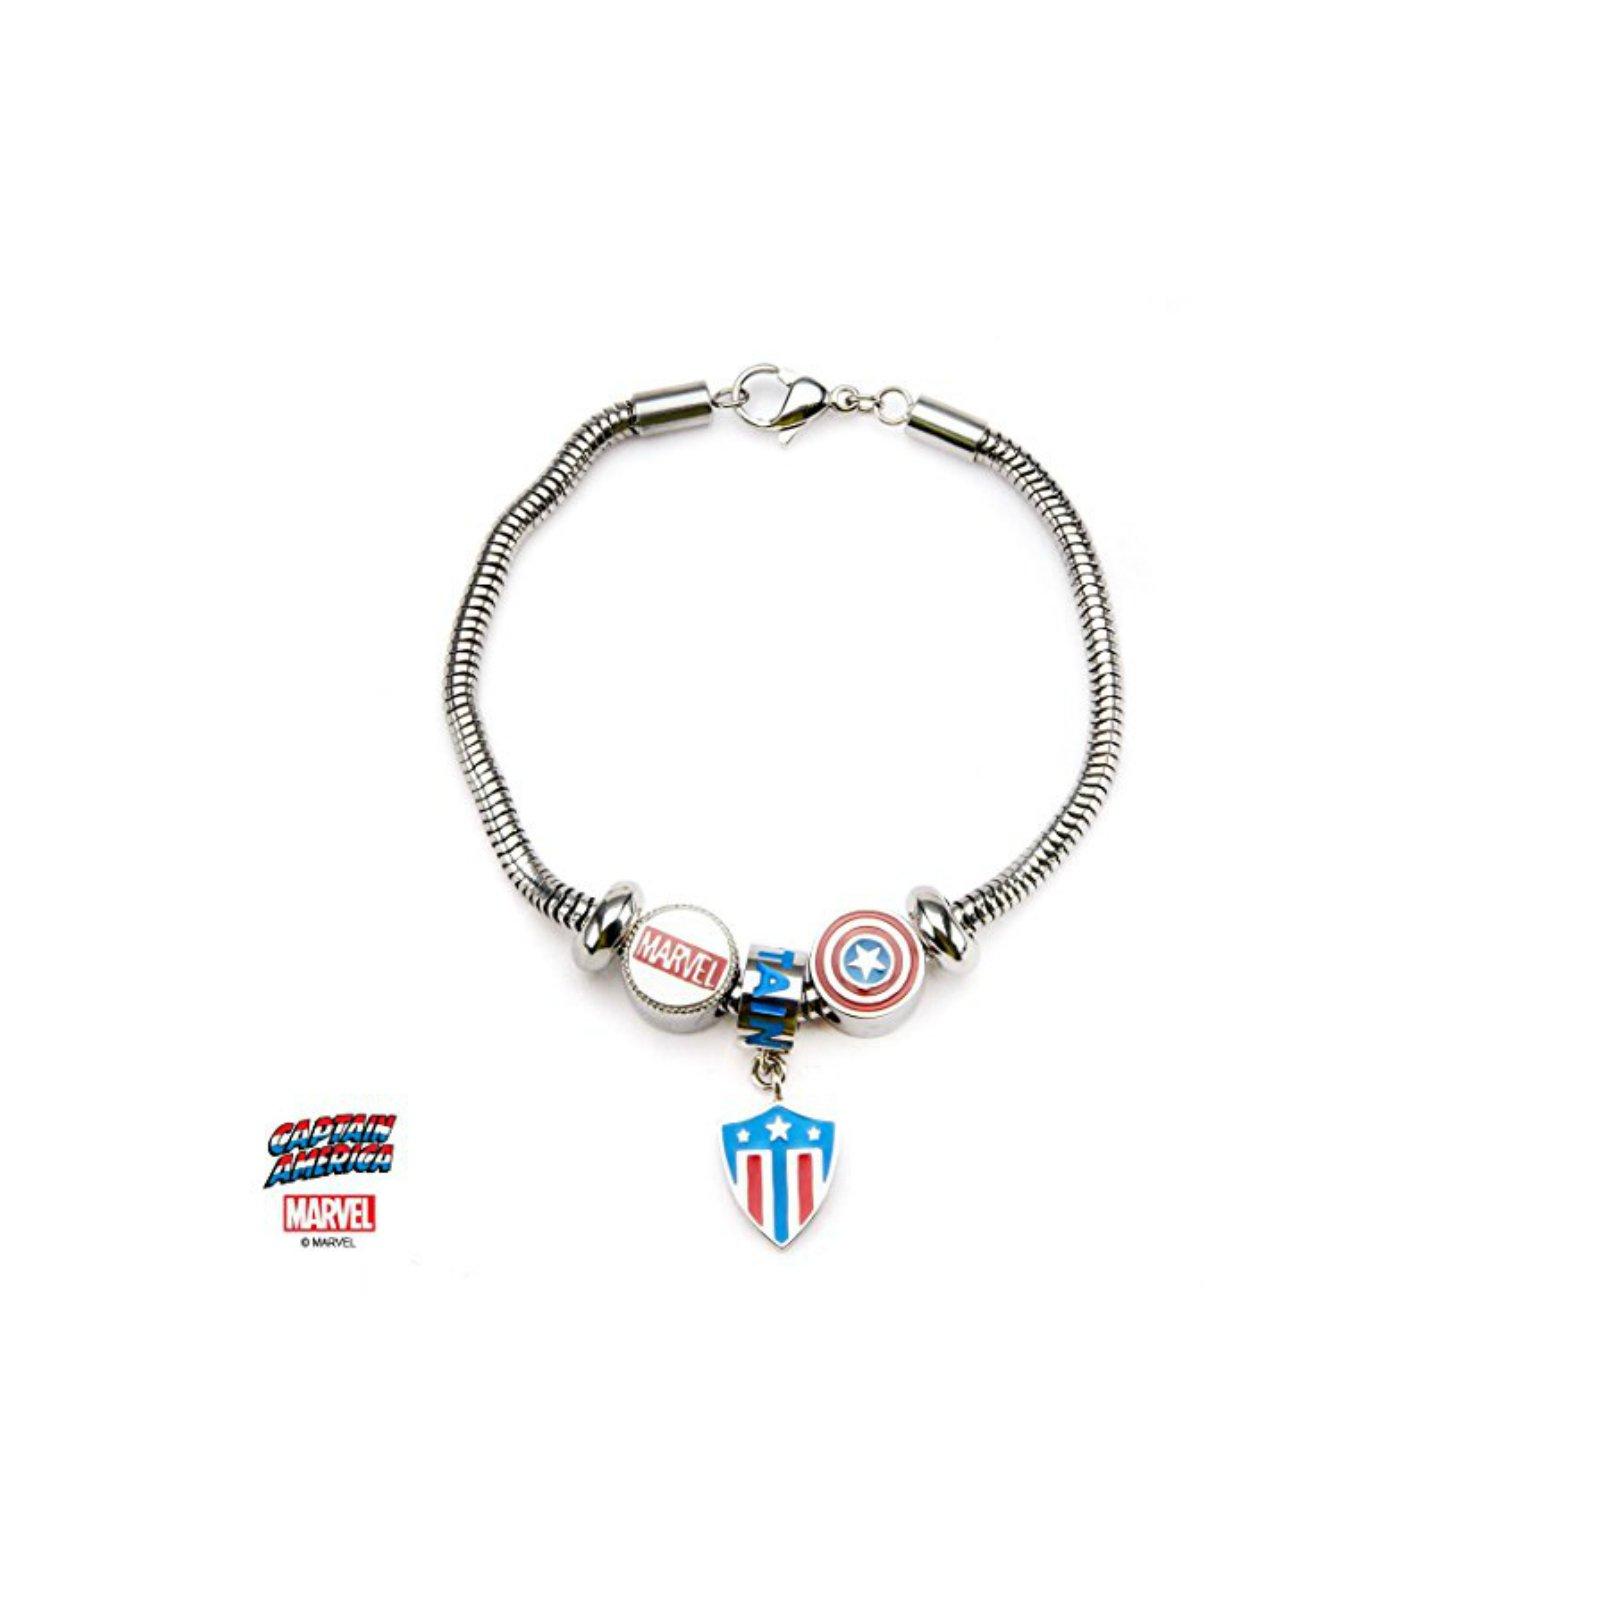 Athena Brand Marvel Captain America Stainless Steel Bead Charm Bracelet in Gift Box